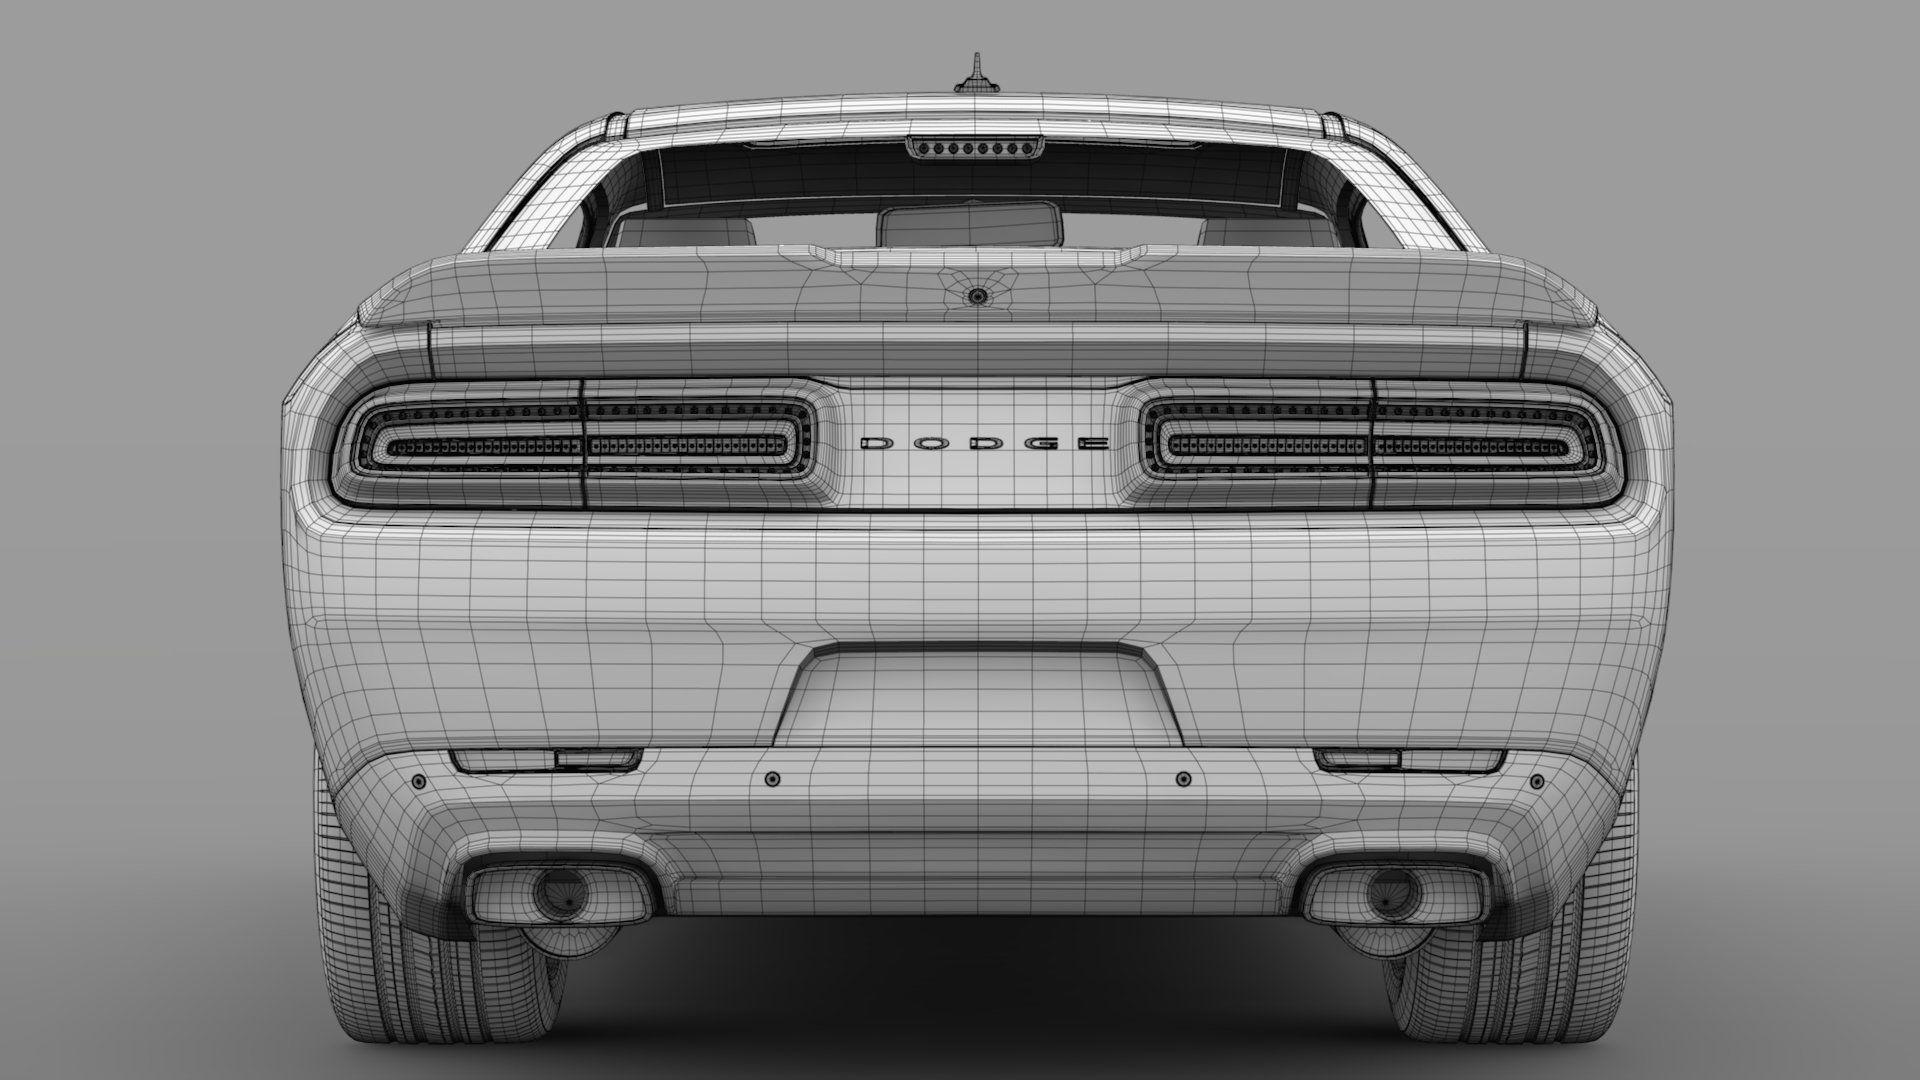 Dodge Challenger Gt Awd 2017 In 2020 Dodge Challenger Dodge Challenger Srt Challenger Srt Demon